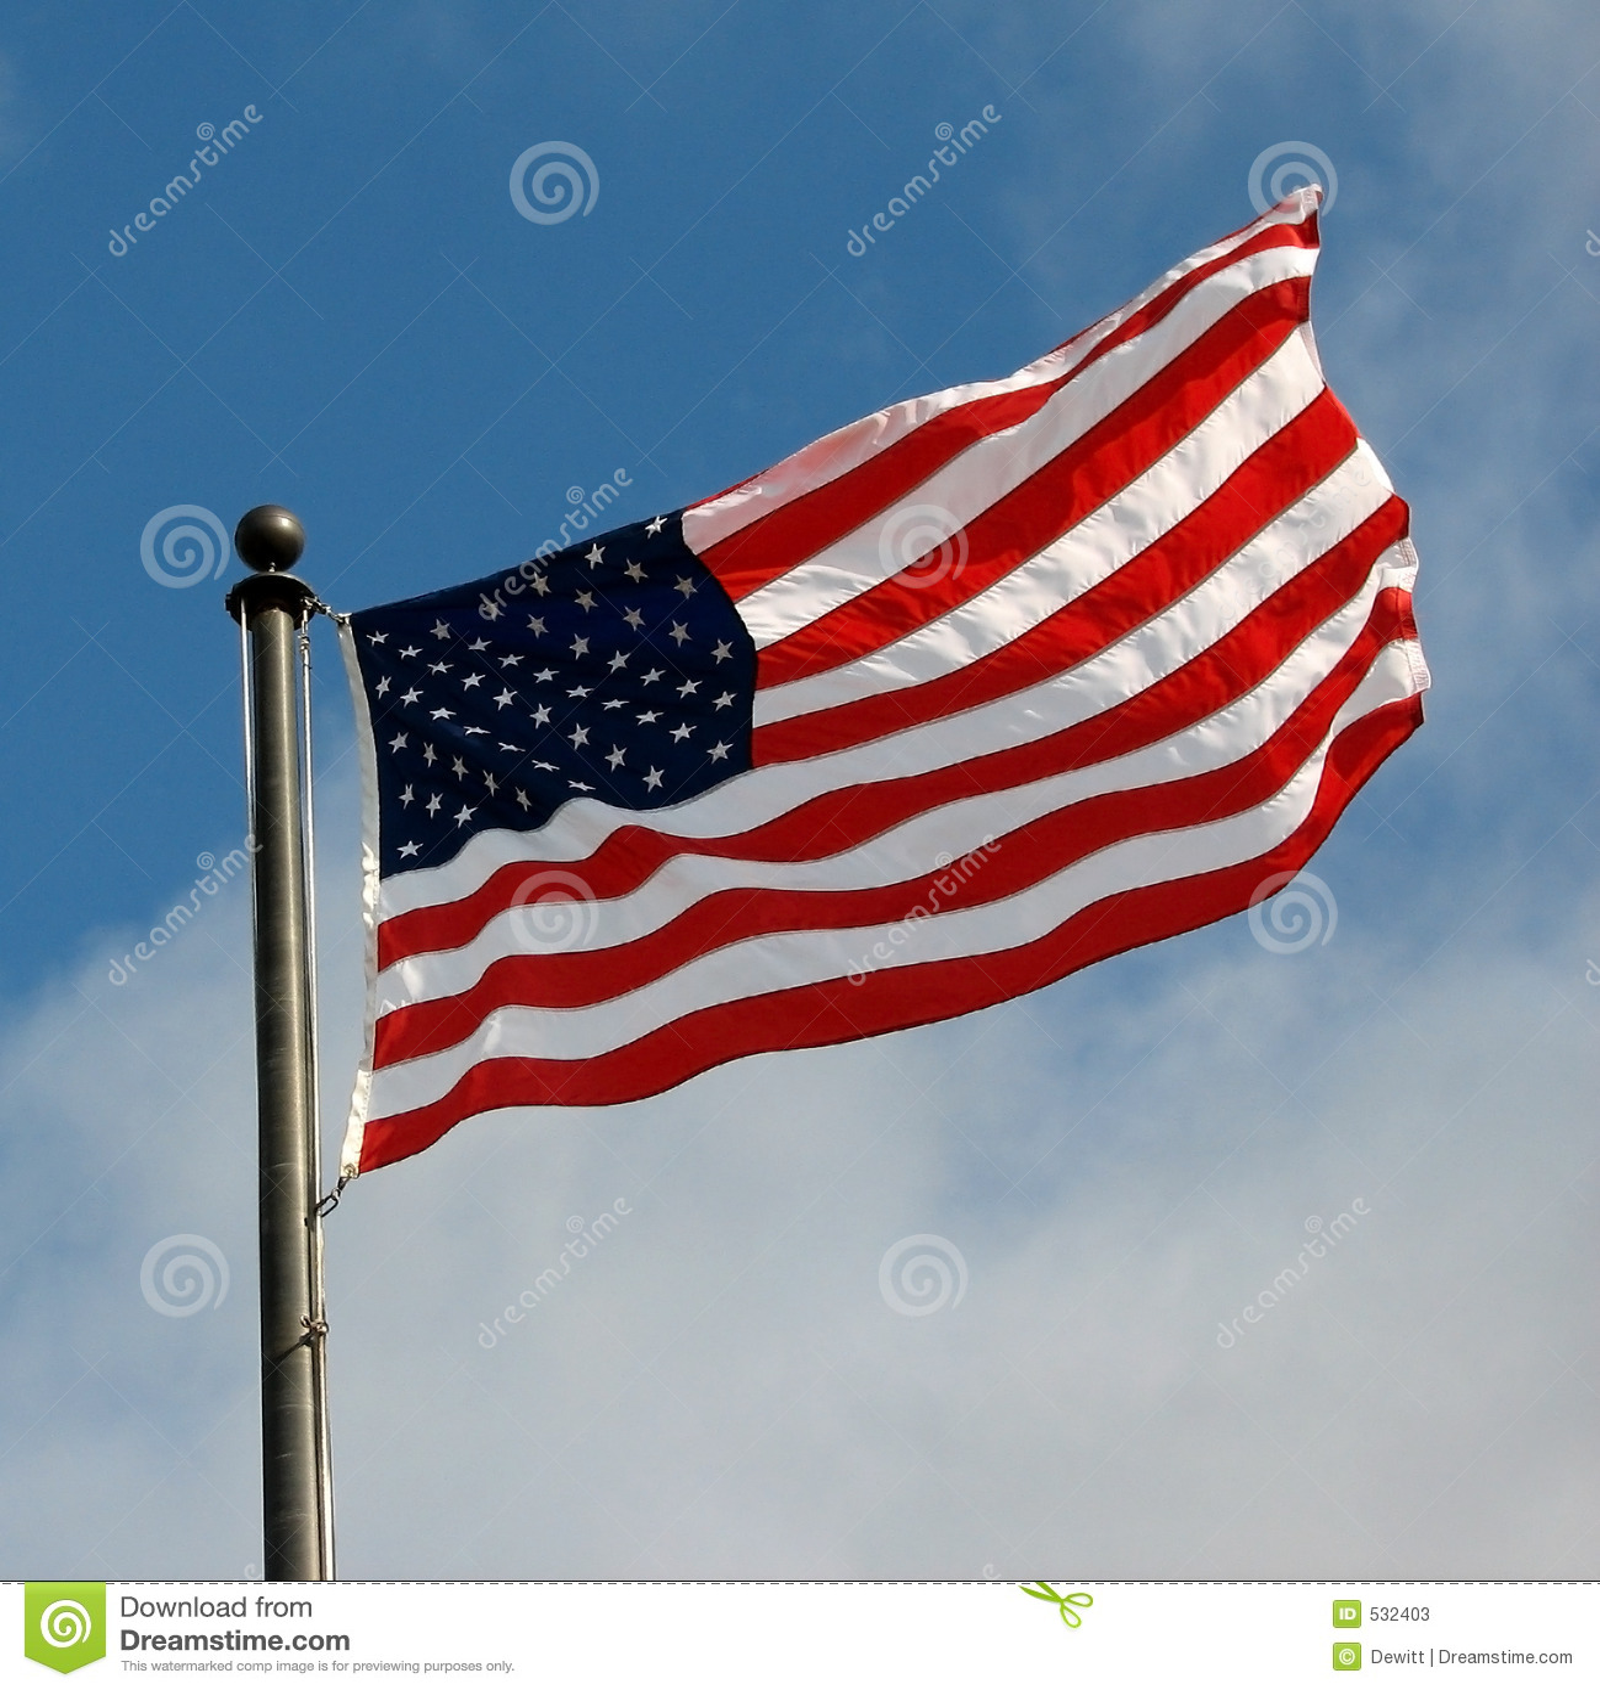 Download 美国国旗 库存图片. 图片 包括有 历史记录, 亚马逊, 云彩, 数据条, 没人, 国家(地区), 独立, ,并且 - 532403